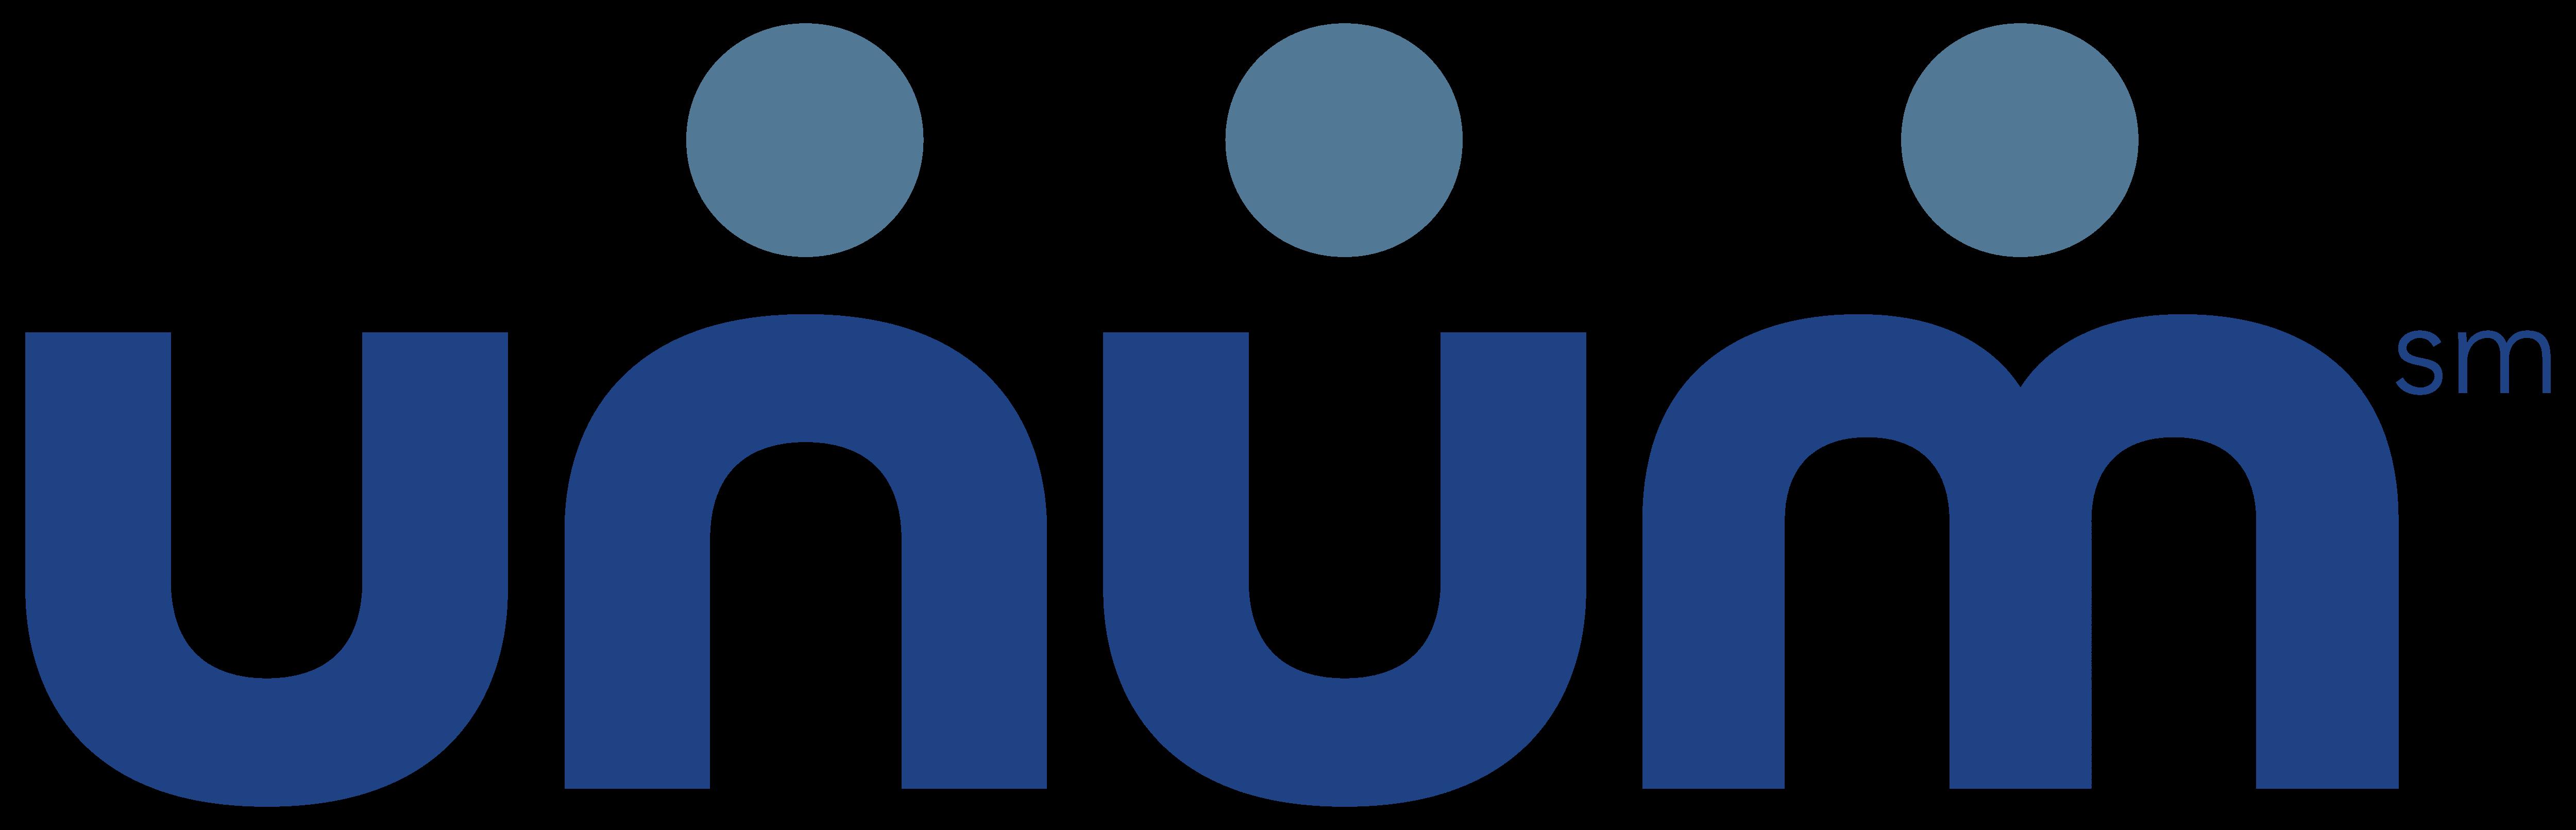 Unum Logos Download